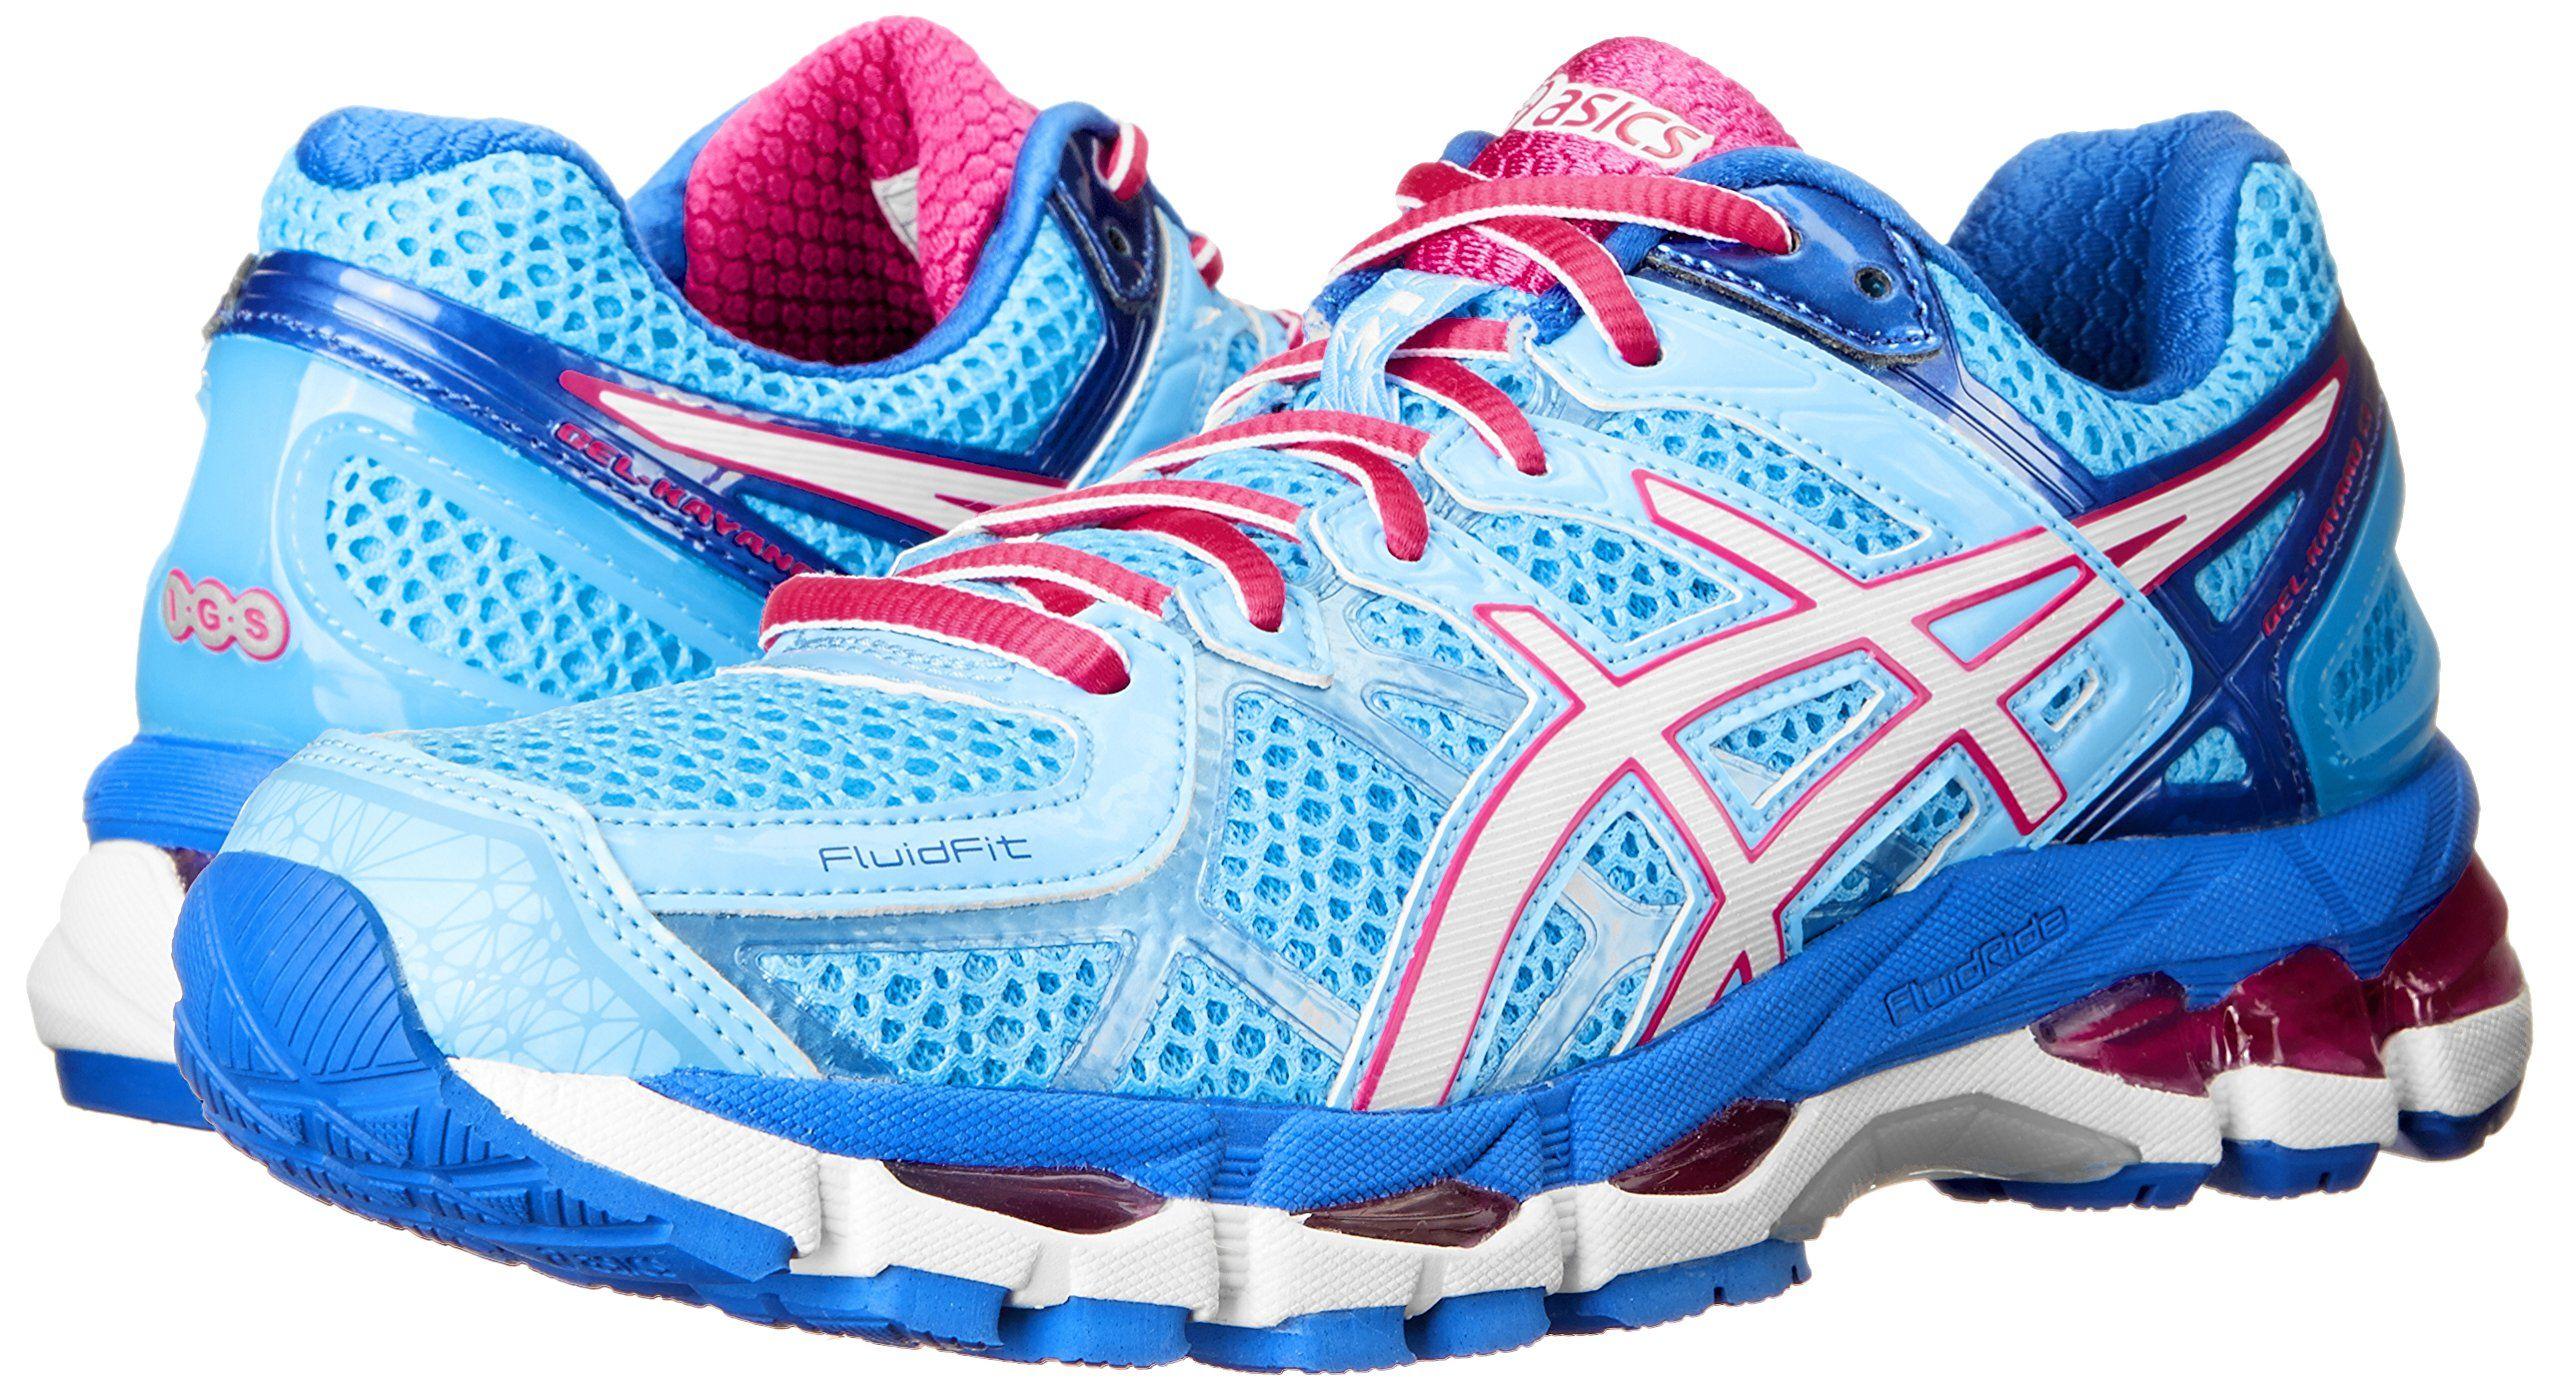 ASICS Women's Gel kayano 21 Running Shoe, Powder BlueWhite